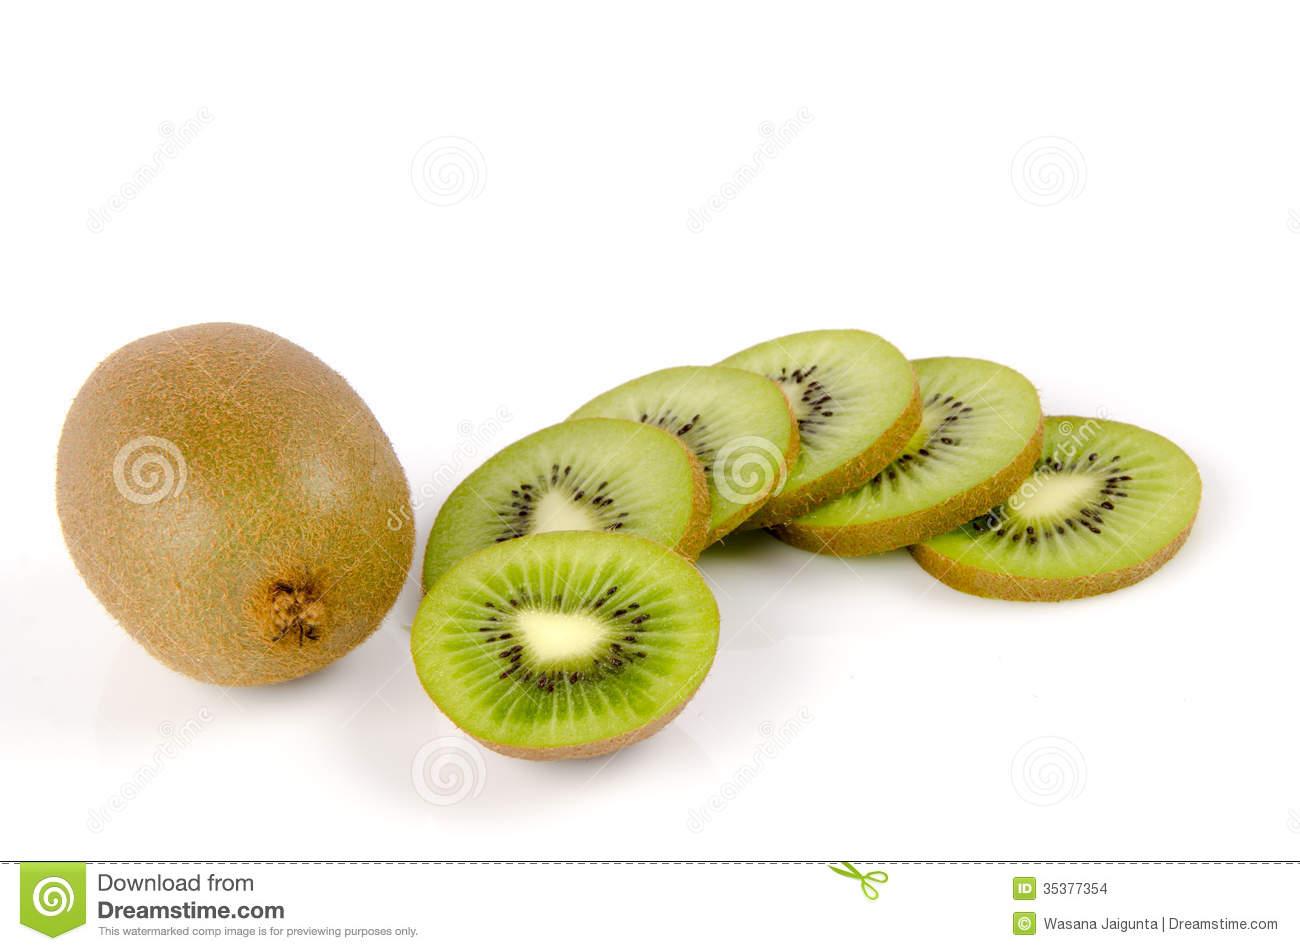 Kiwi Fruit, Chinese Gooseberry (Actinidia Chinensis). Stock Images.